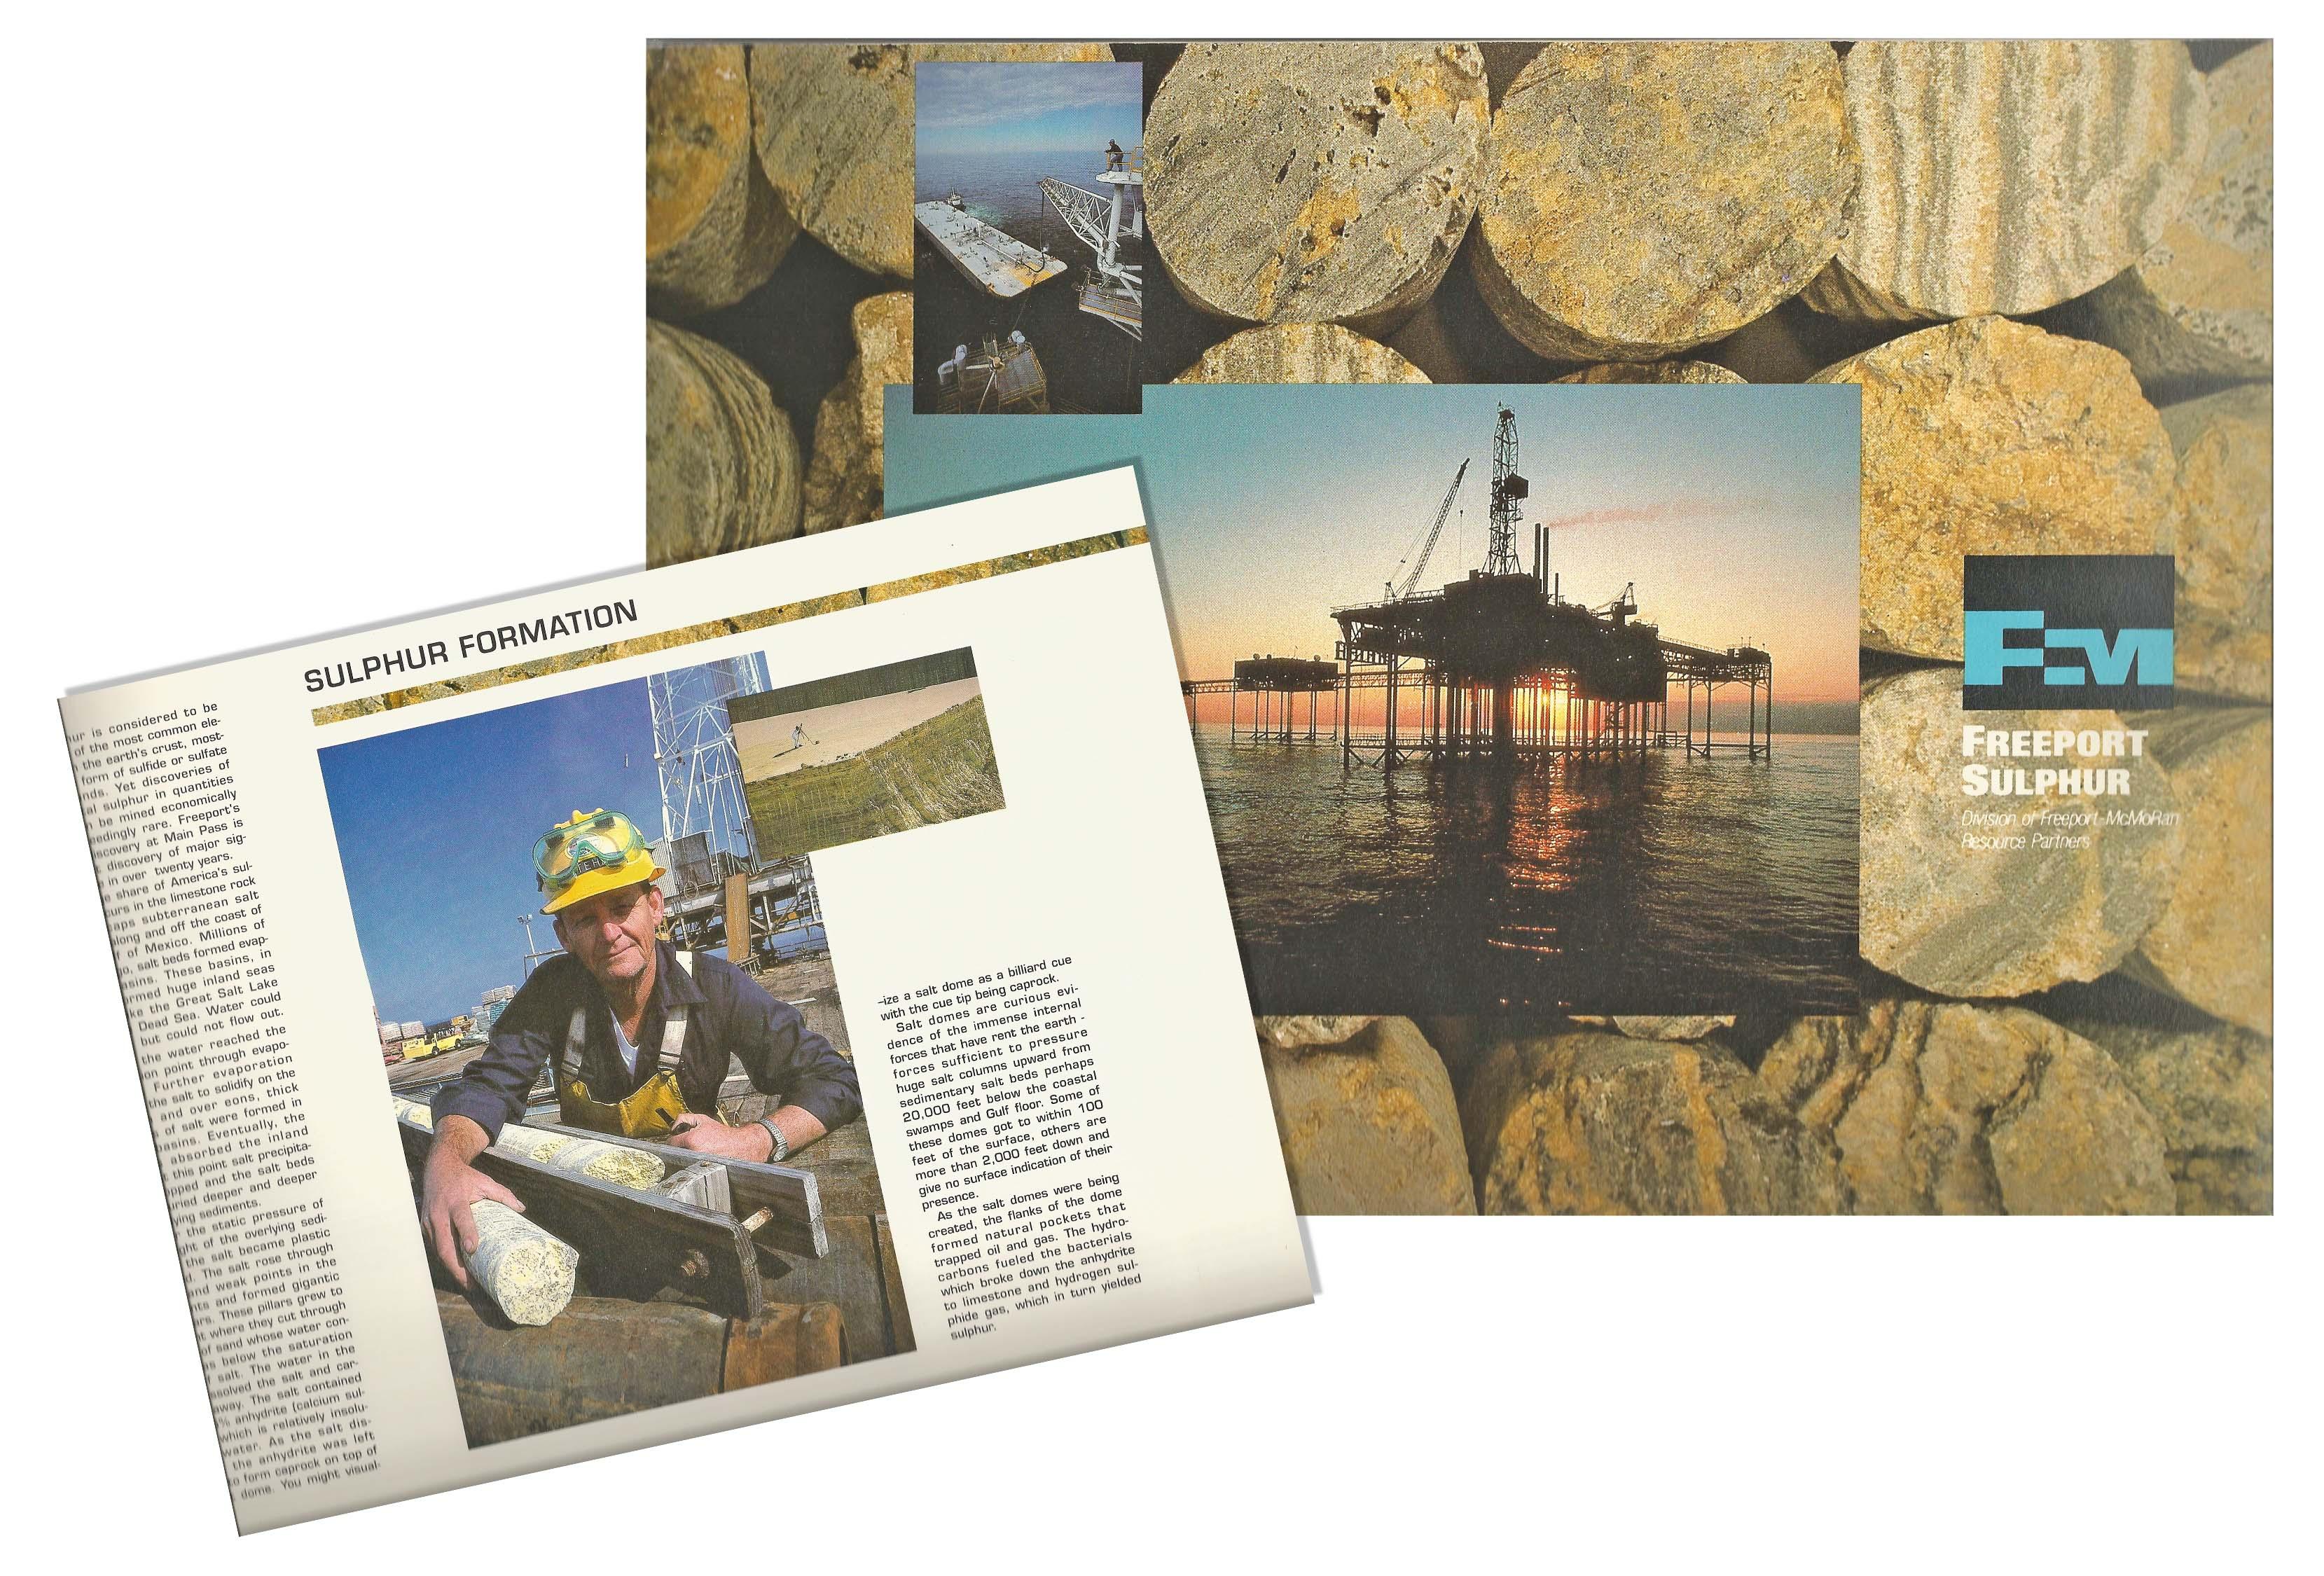 Brochure for Freeport McMoran